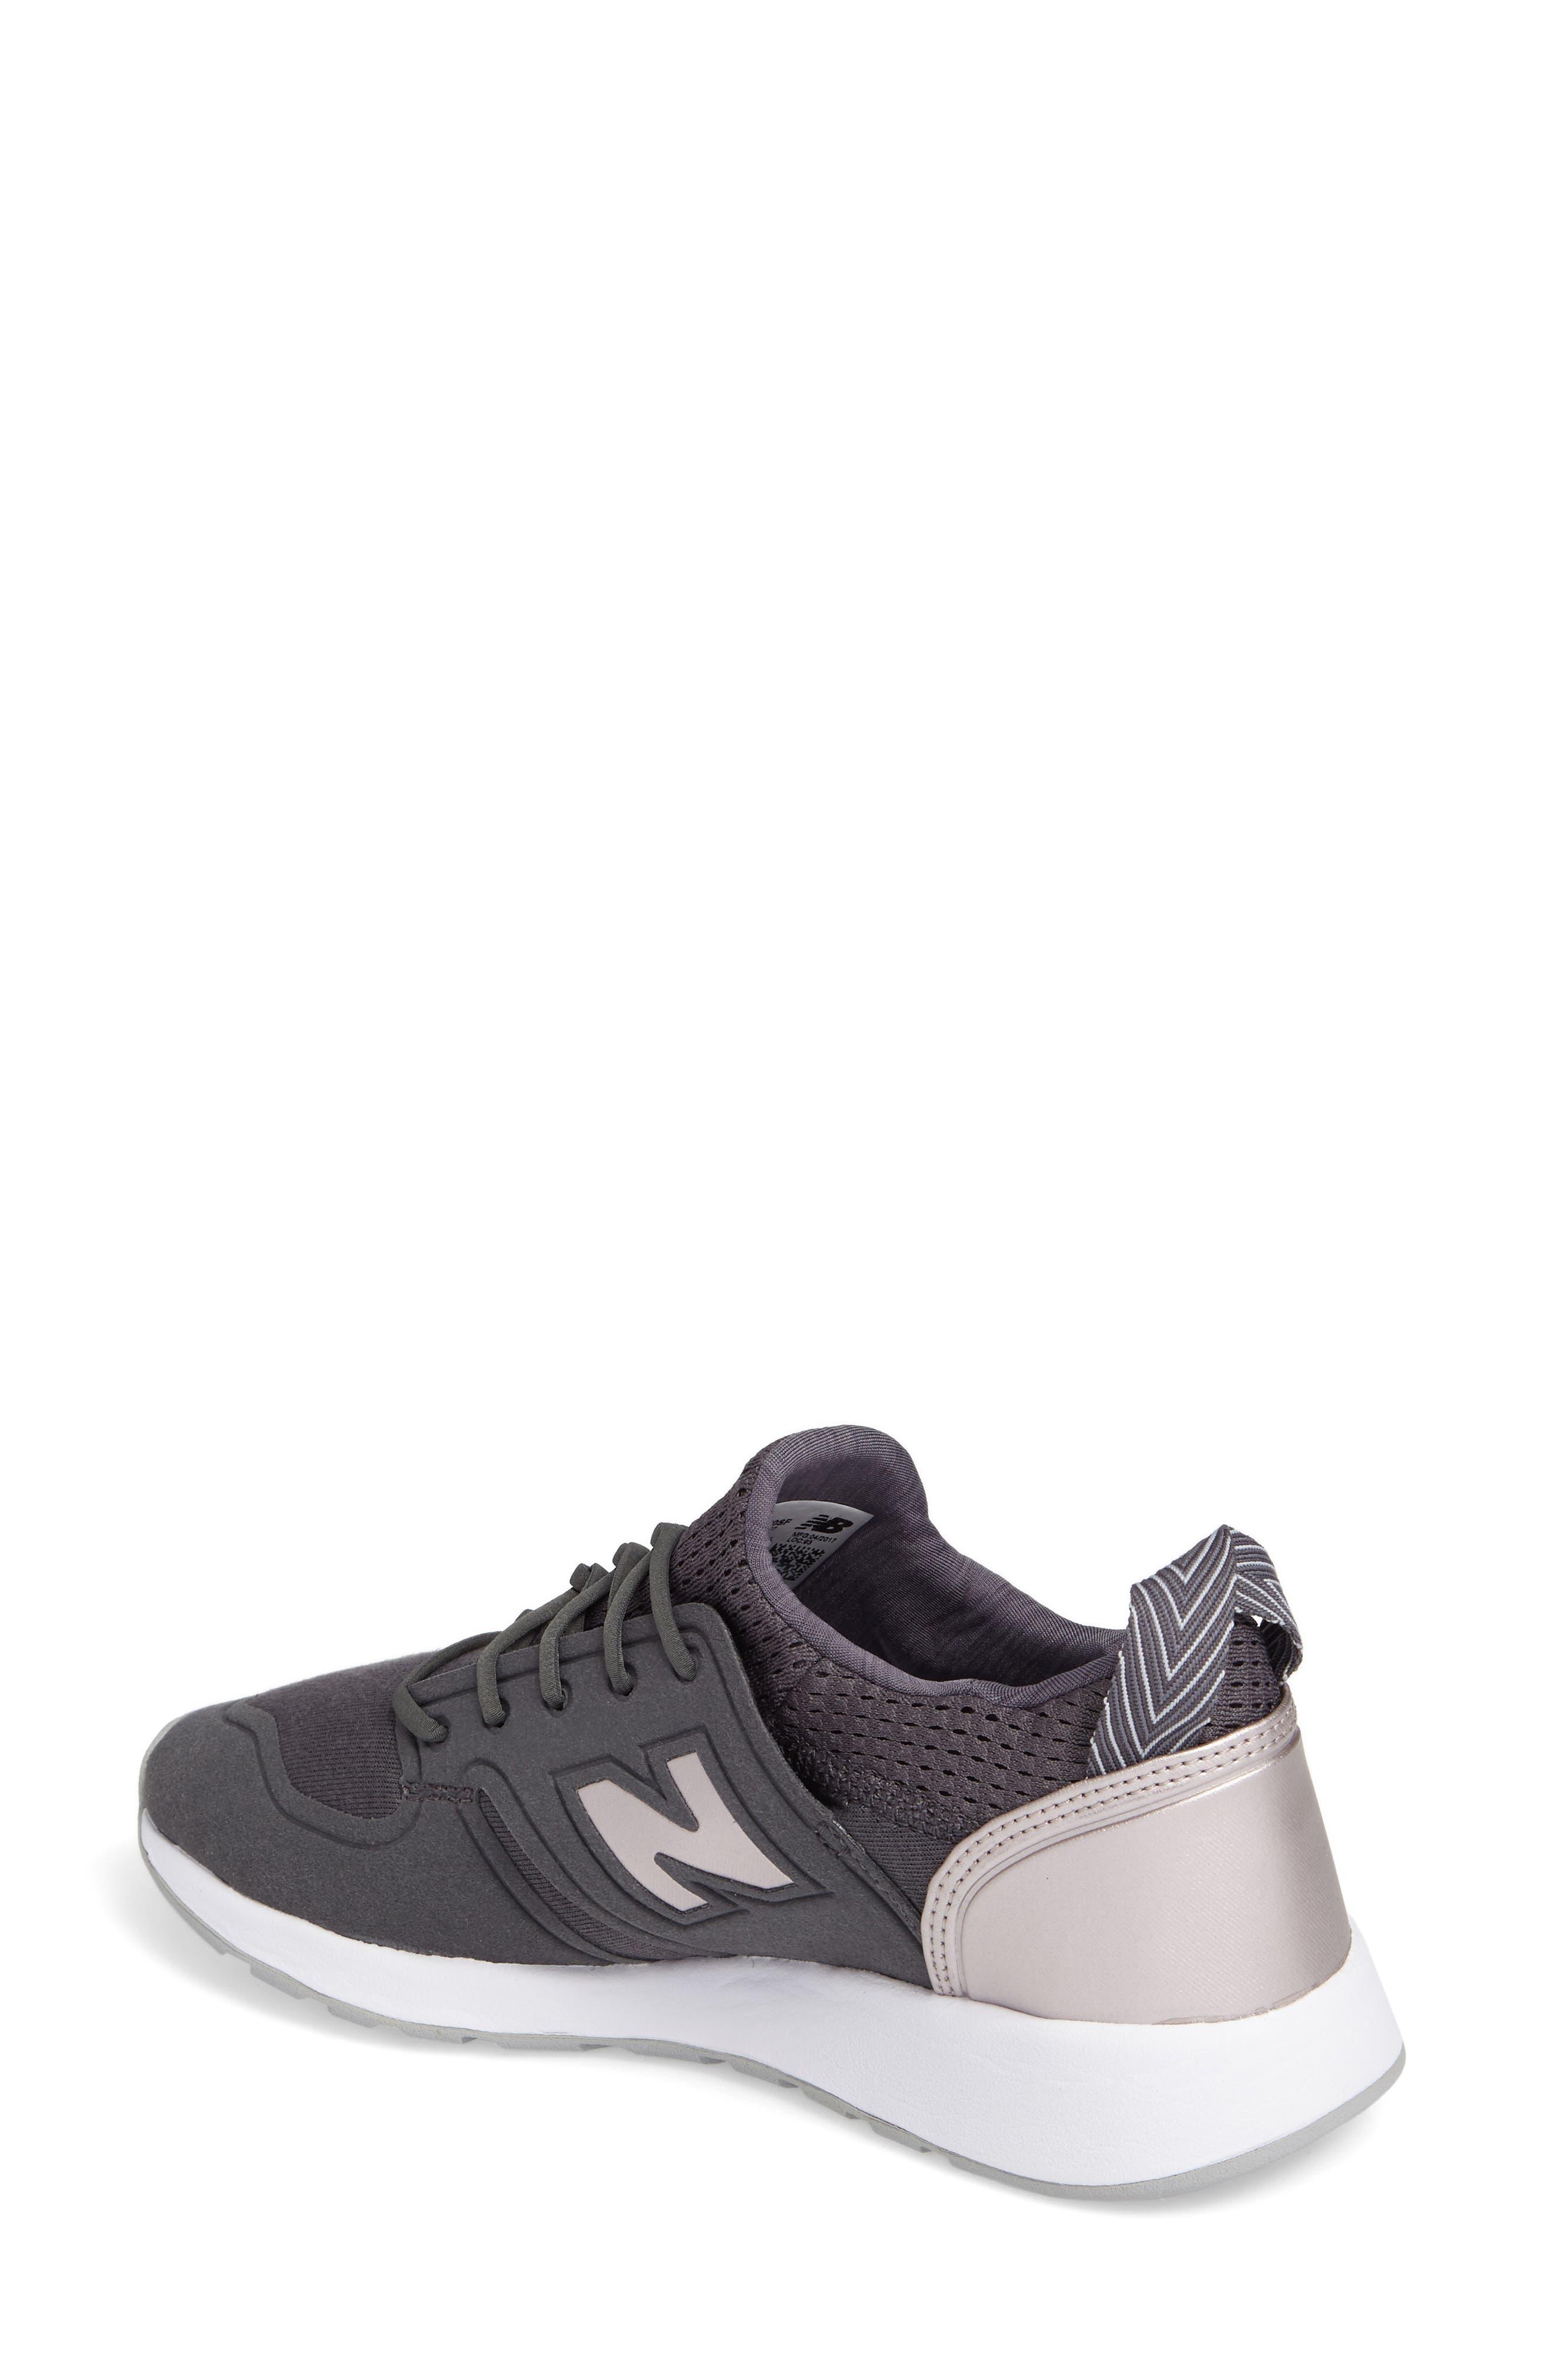 NEW BALANCE, '420' Sneaker, Alternate thumbnail 2, color, 021